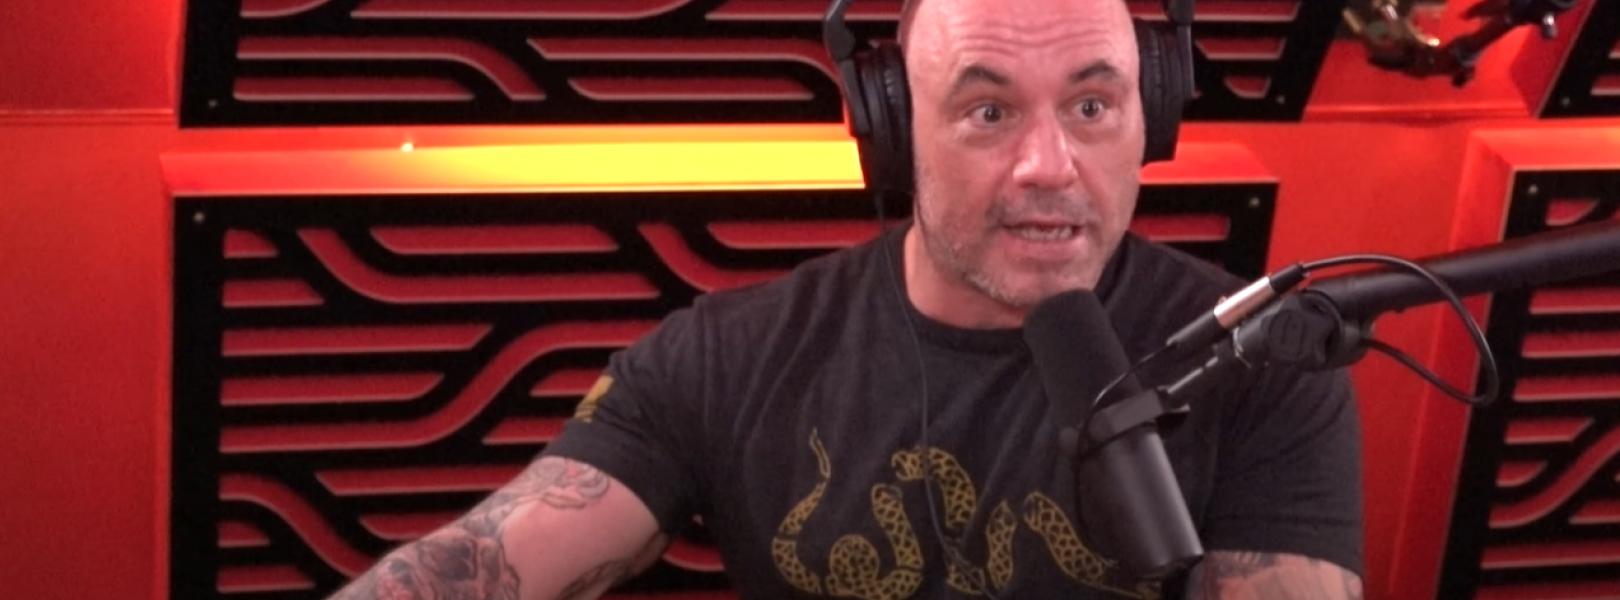 Joe Rogan in a black shirt